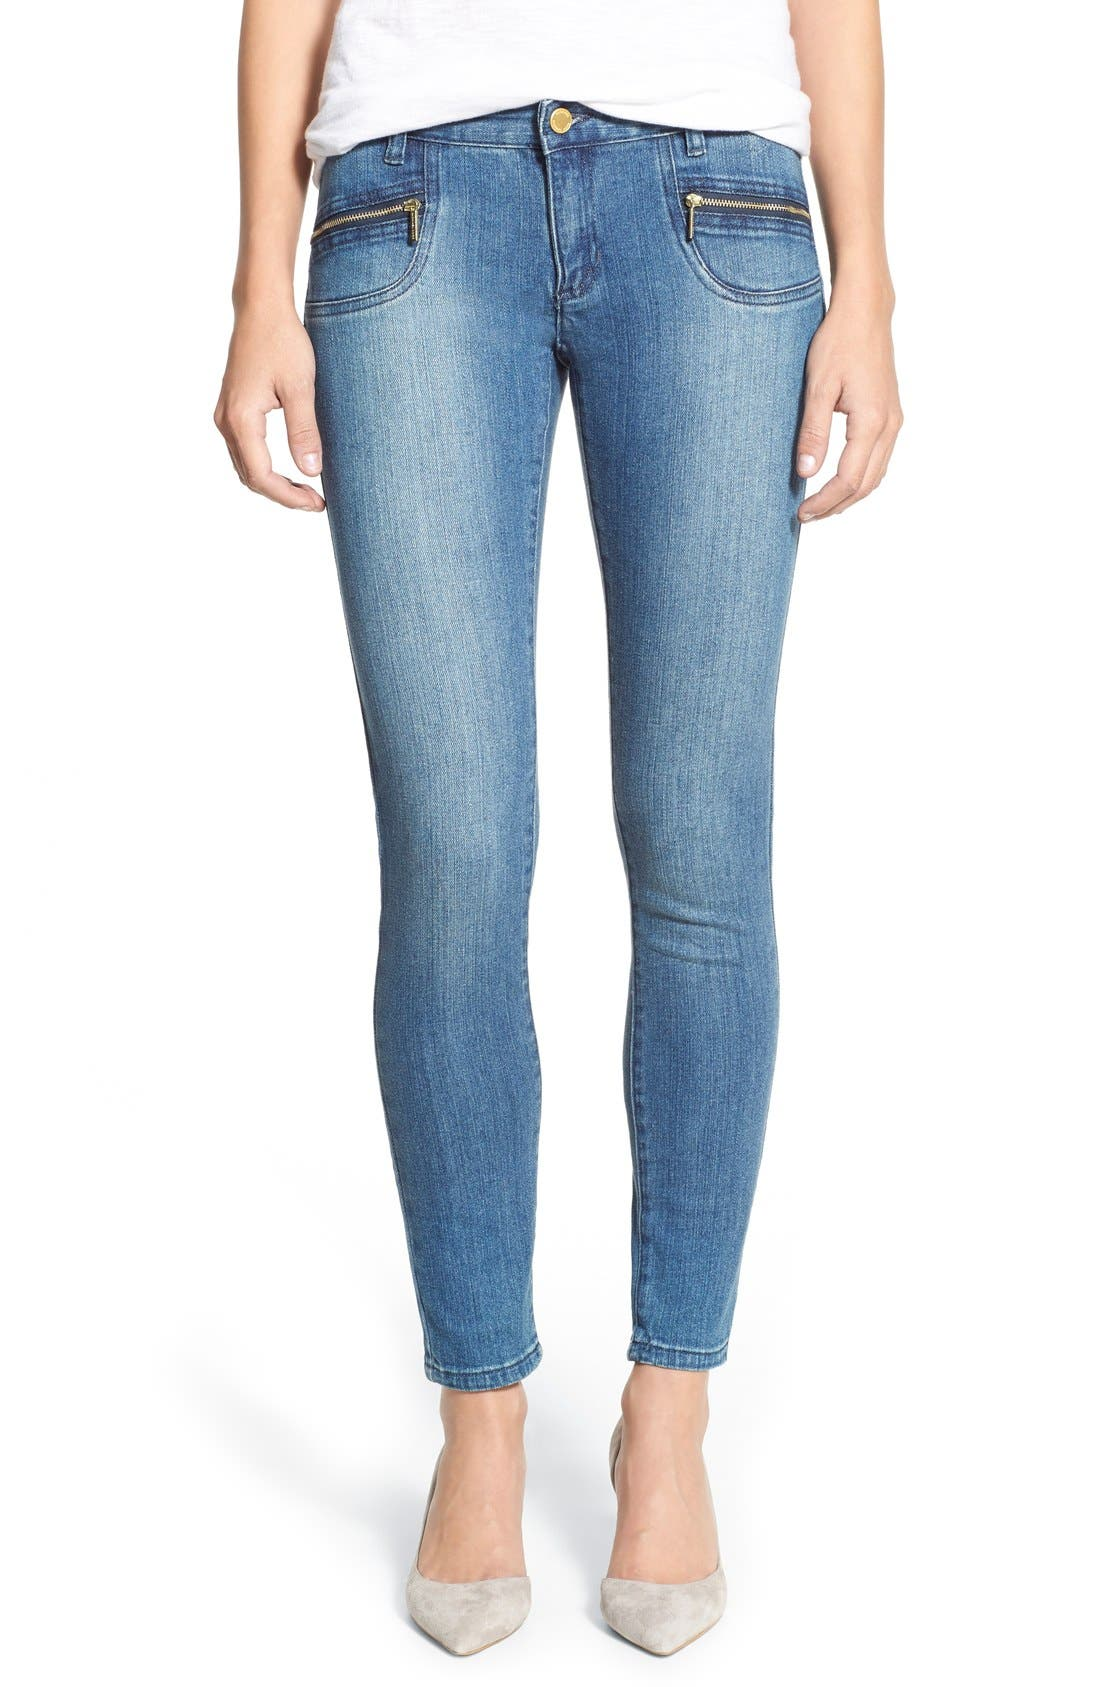 Alternate Image 1 Selected - MICHAEL Michael KorsStretch Zip Pocket Ankle Skinny Jeans(Veruschka)